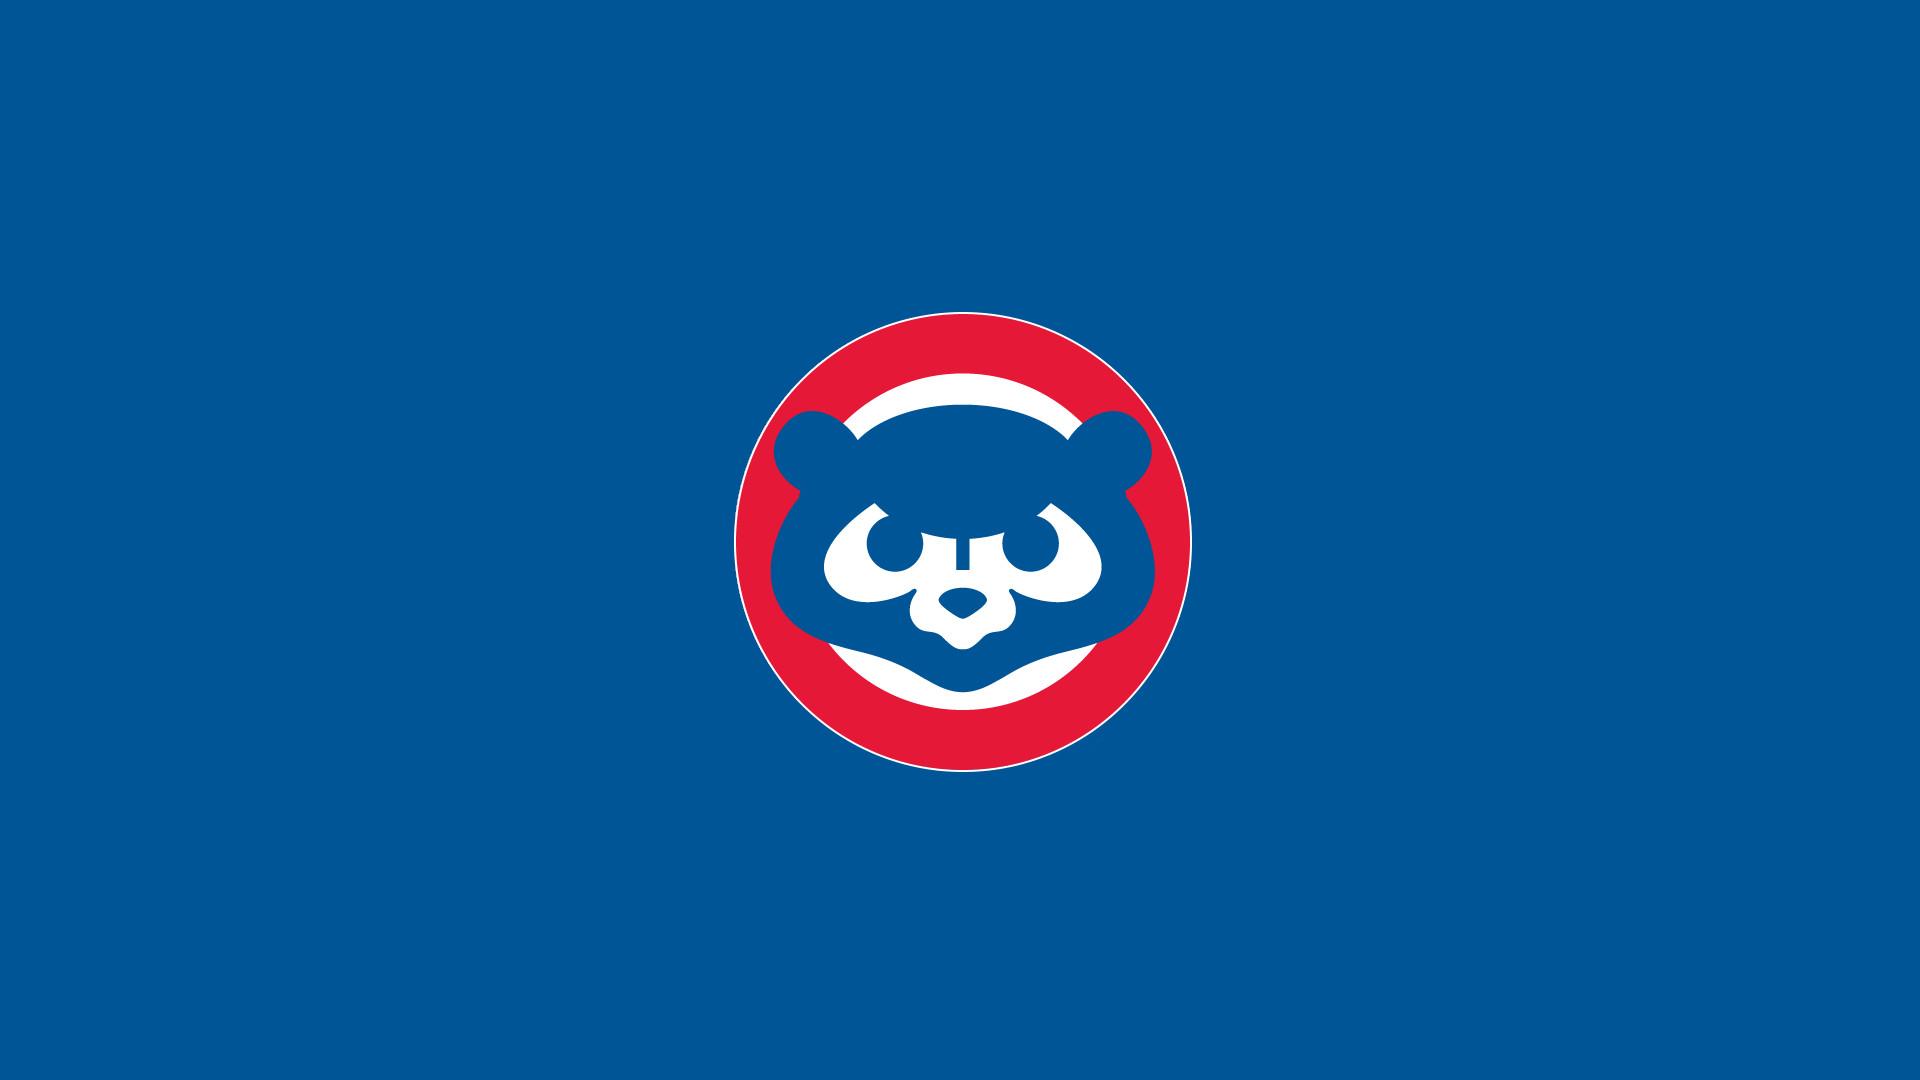 Best 20+ Cubs wallpaper ideas on Pinterest   Chicago cubs wallpaper, Did  the cubs win and Chicago cubs mlb